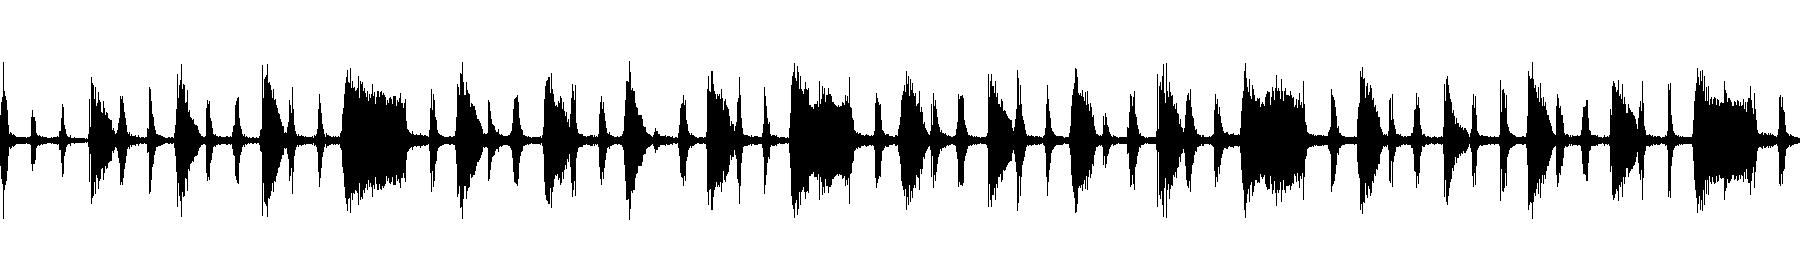 gt076 chords f min 100bpm 01